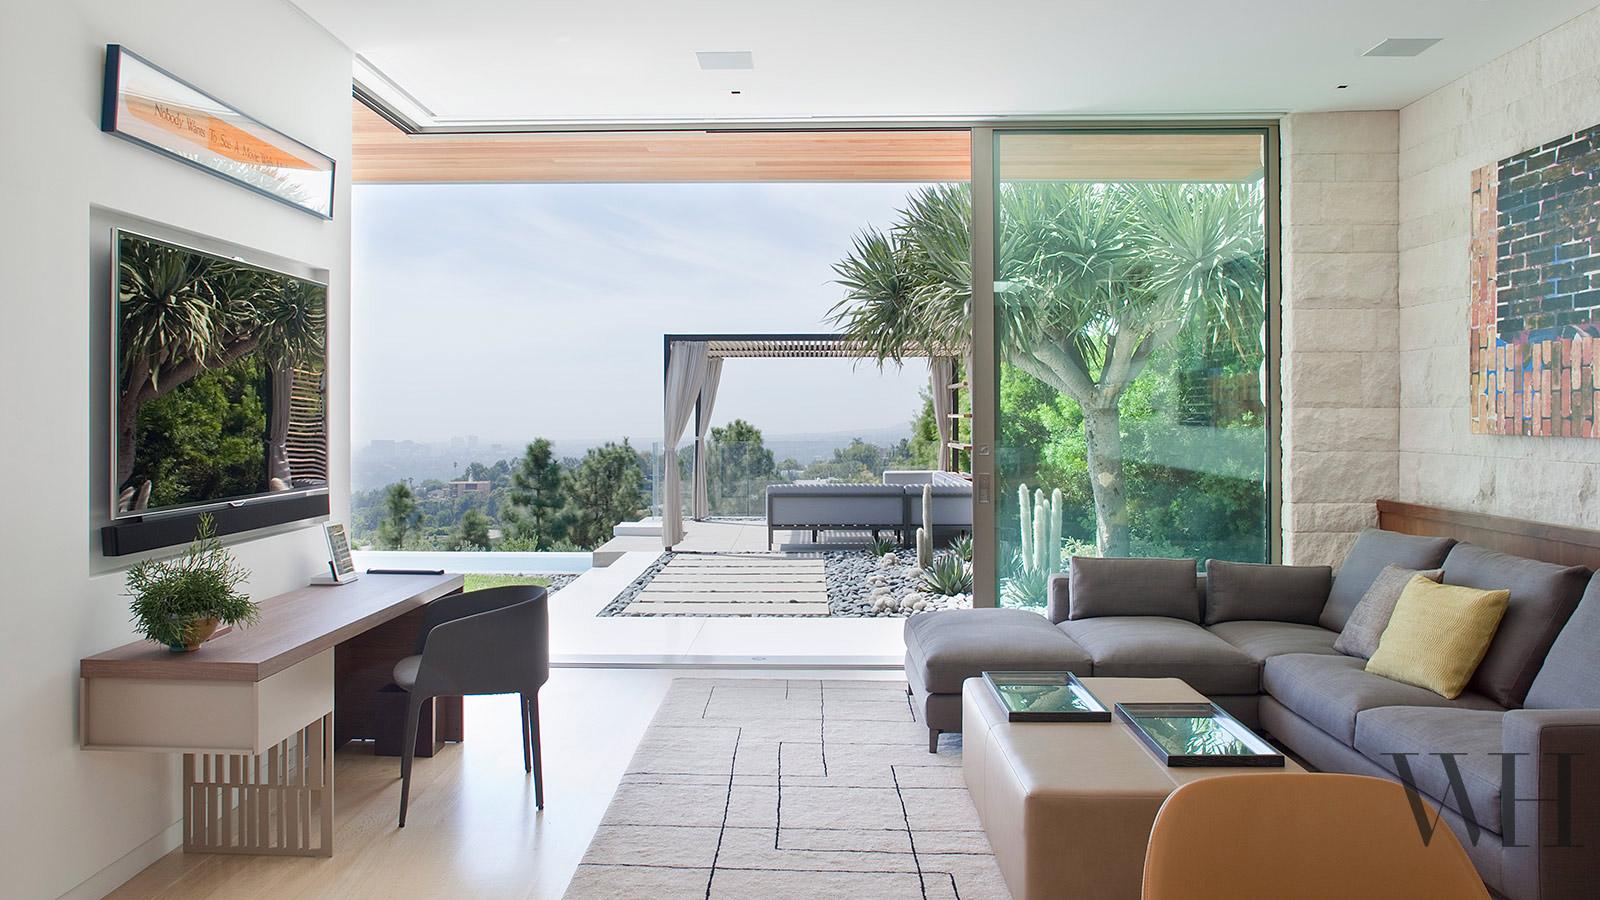 moderninteriordesign  Interior Design Ideas